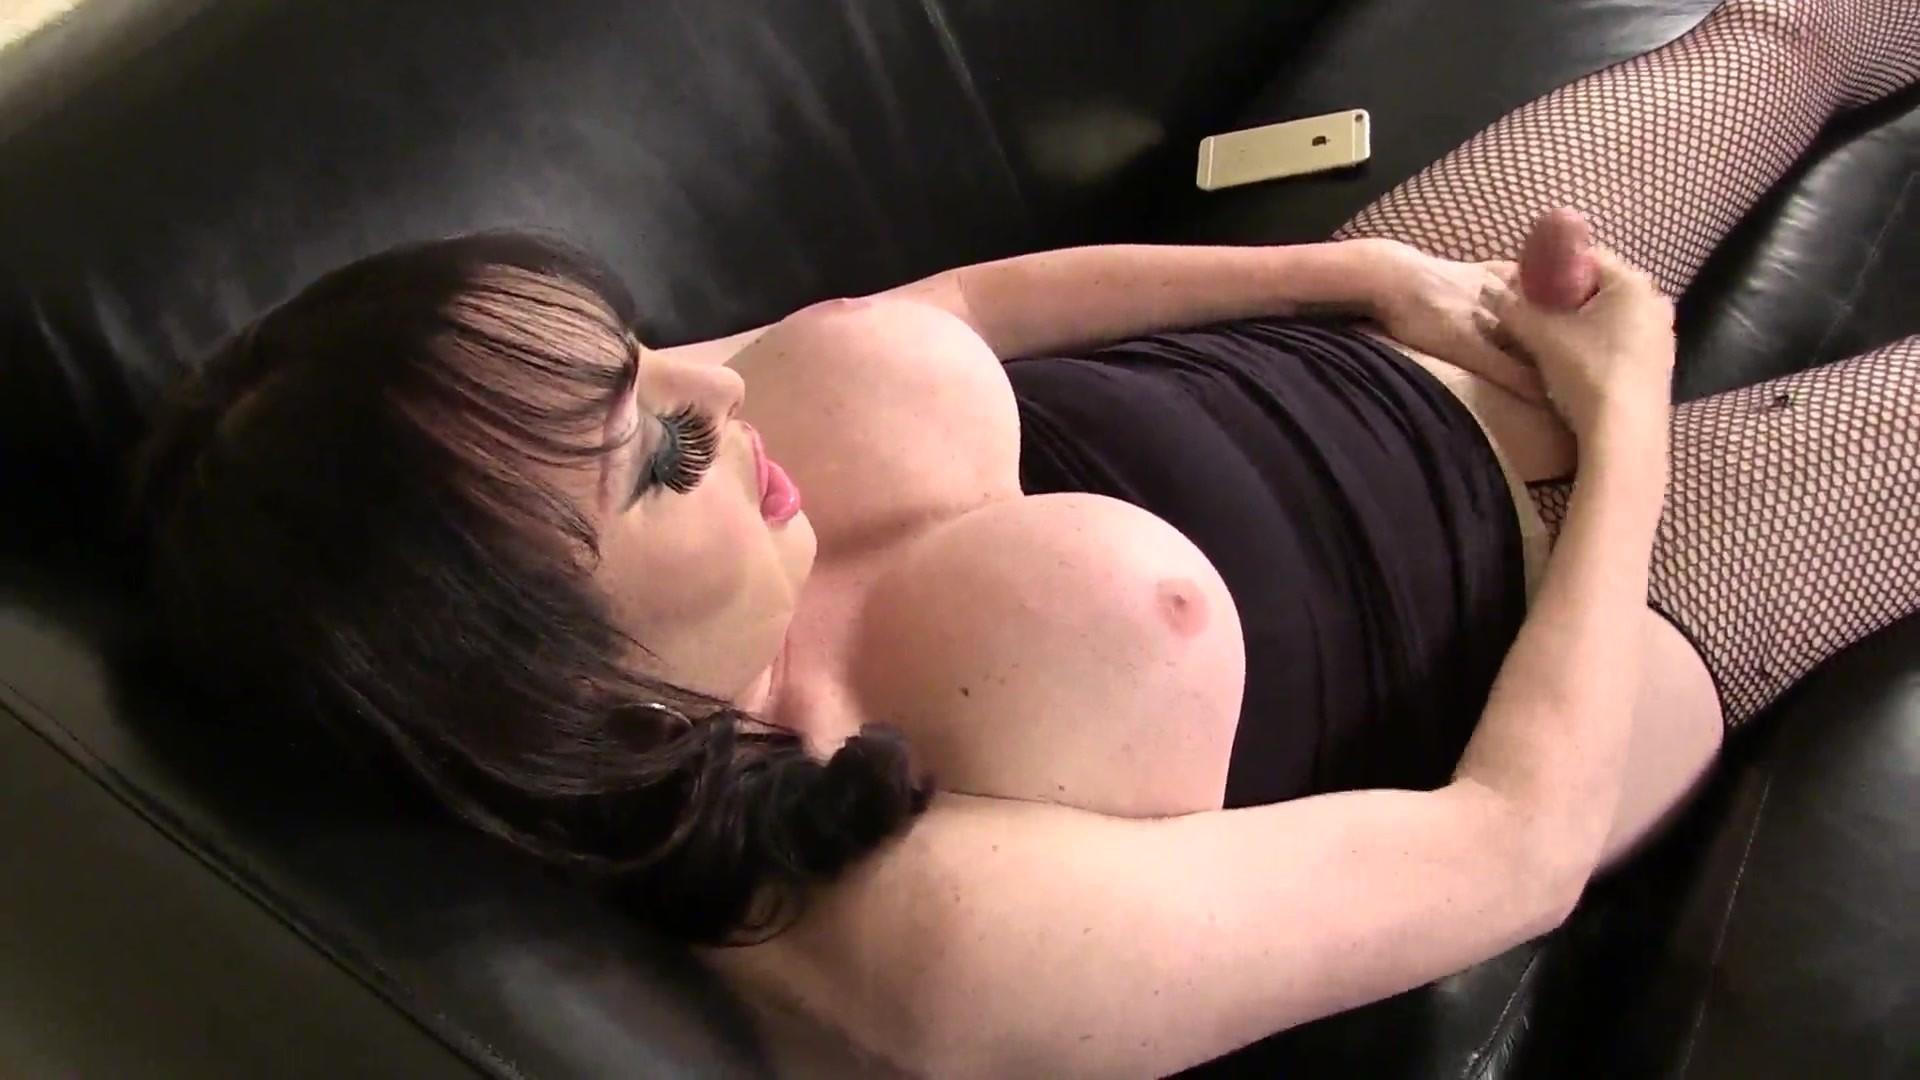 wendy williams sex tape